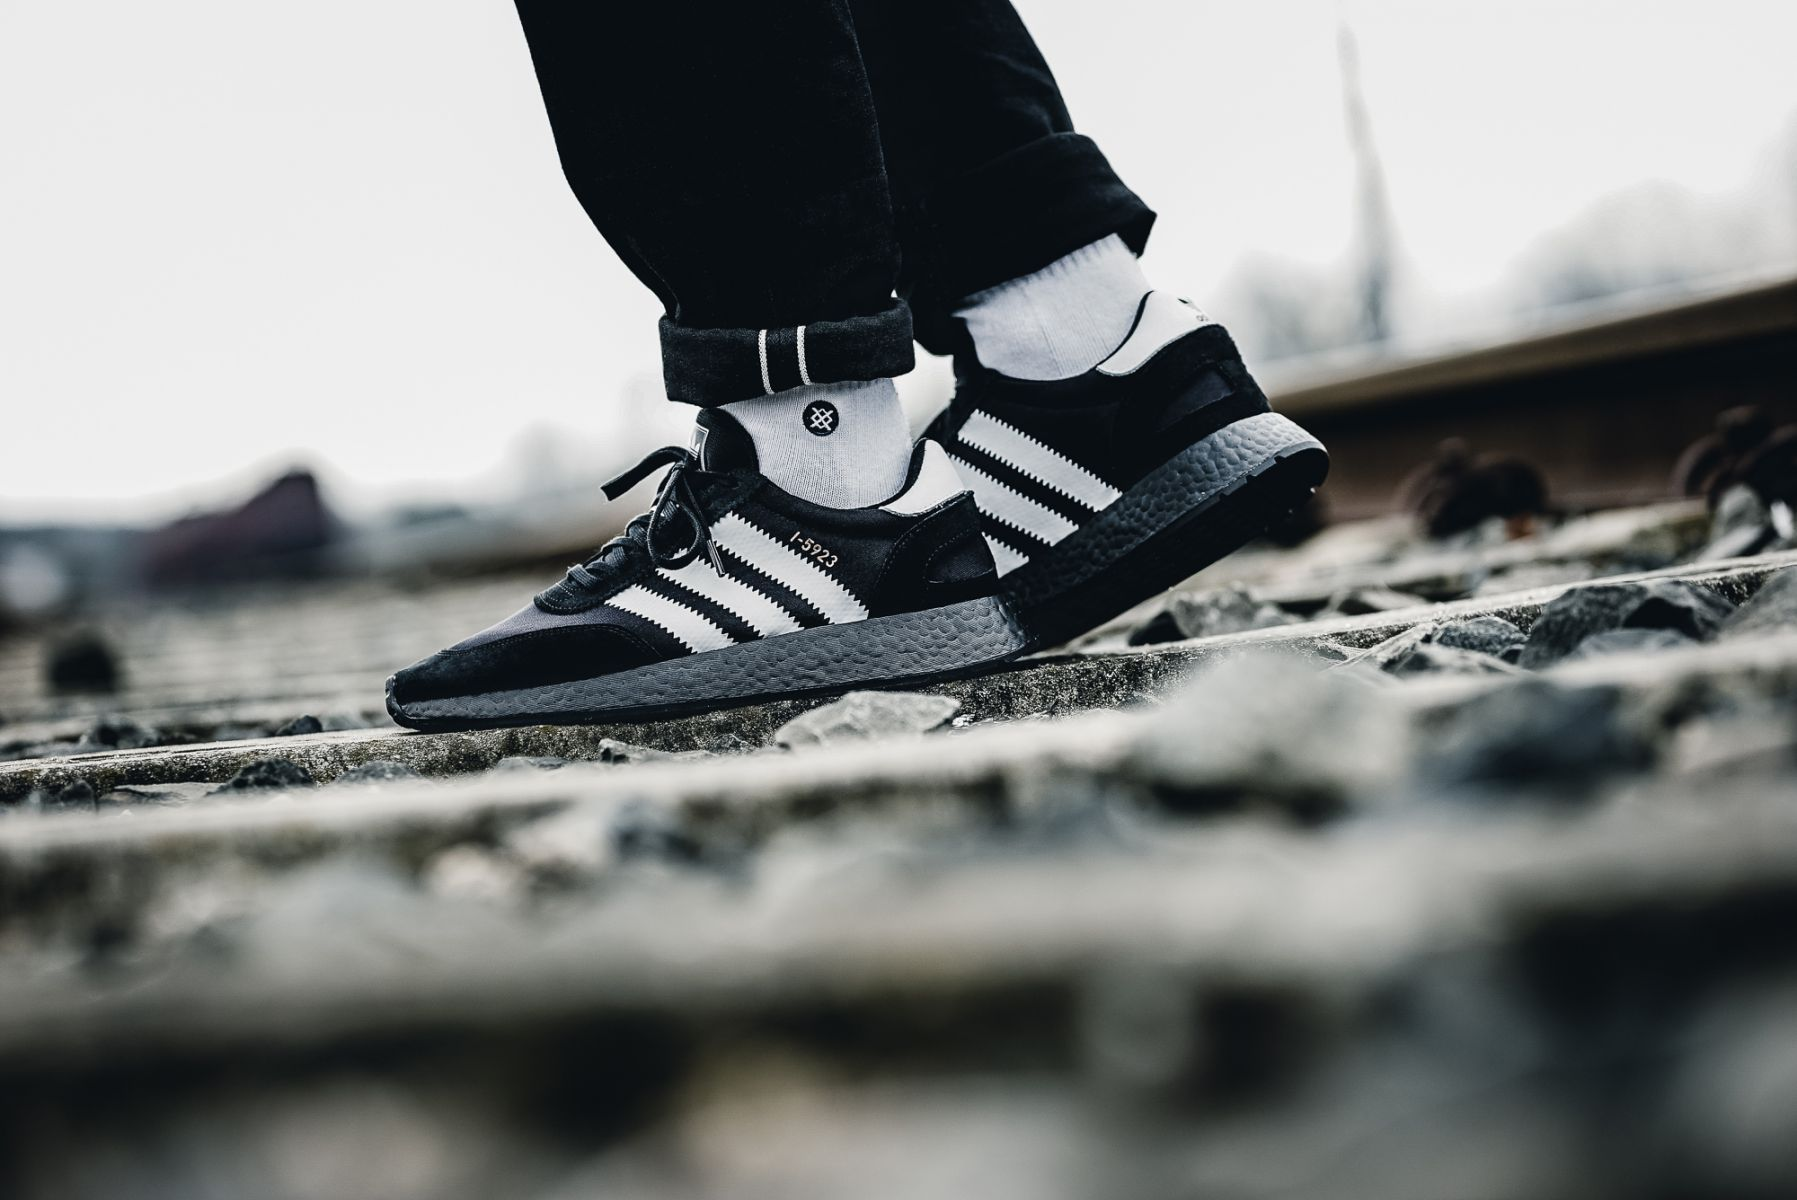 Adidas - 5923 di promuovere nero impulso adidas iniki pinterest adidas